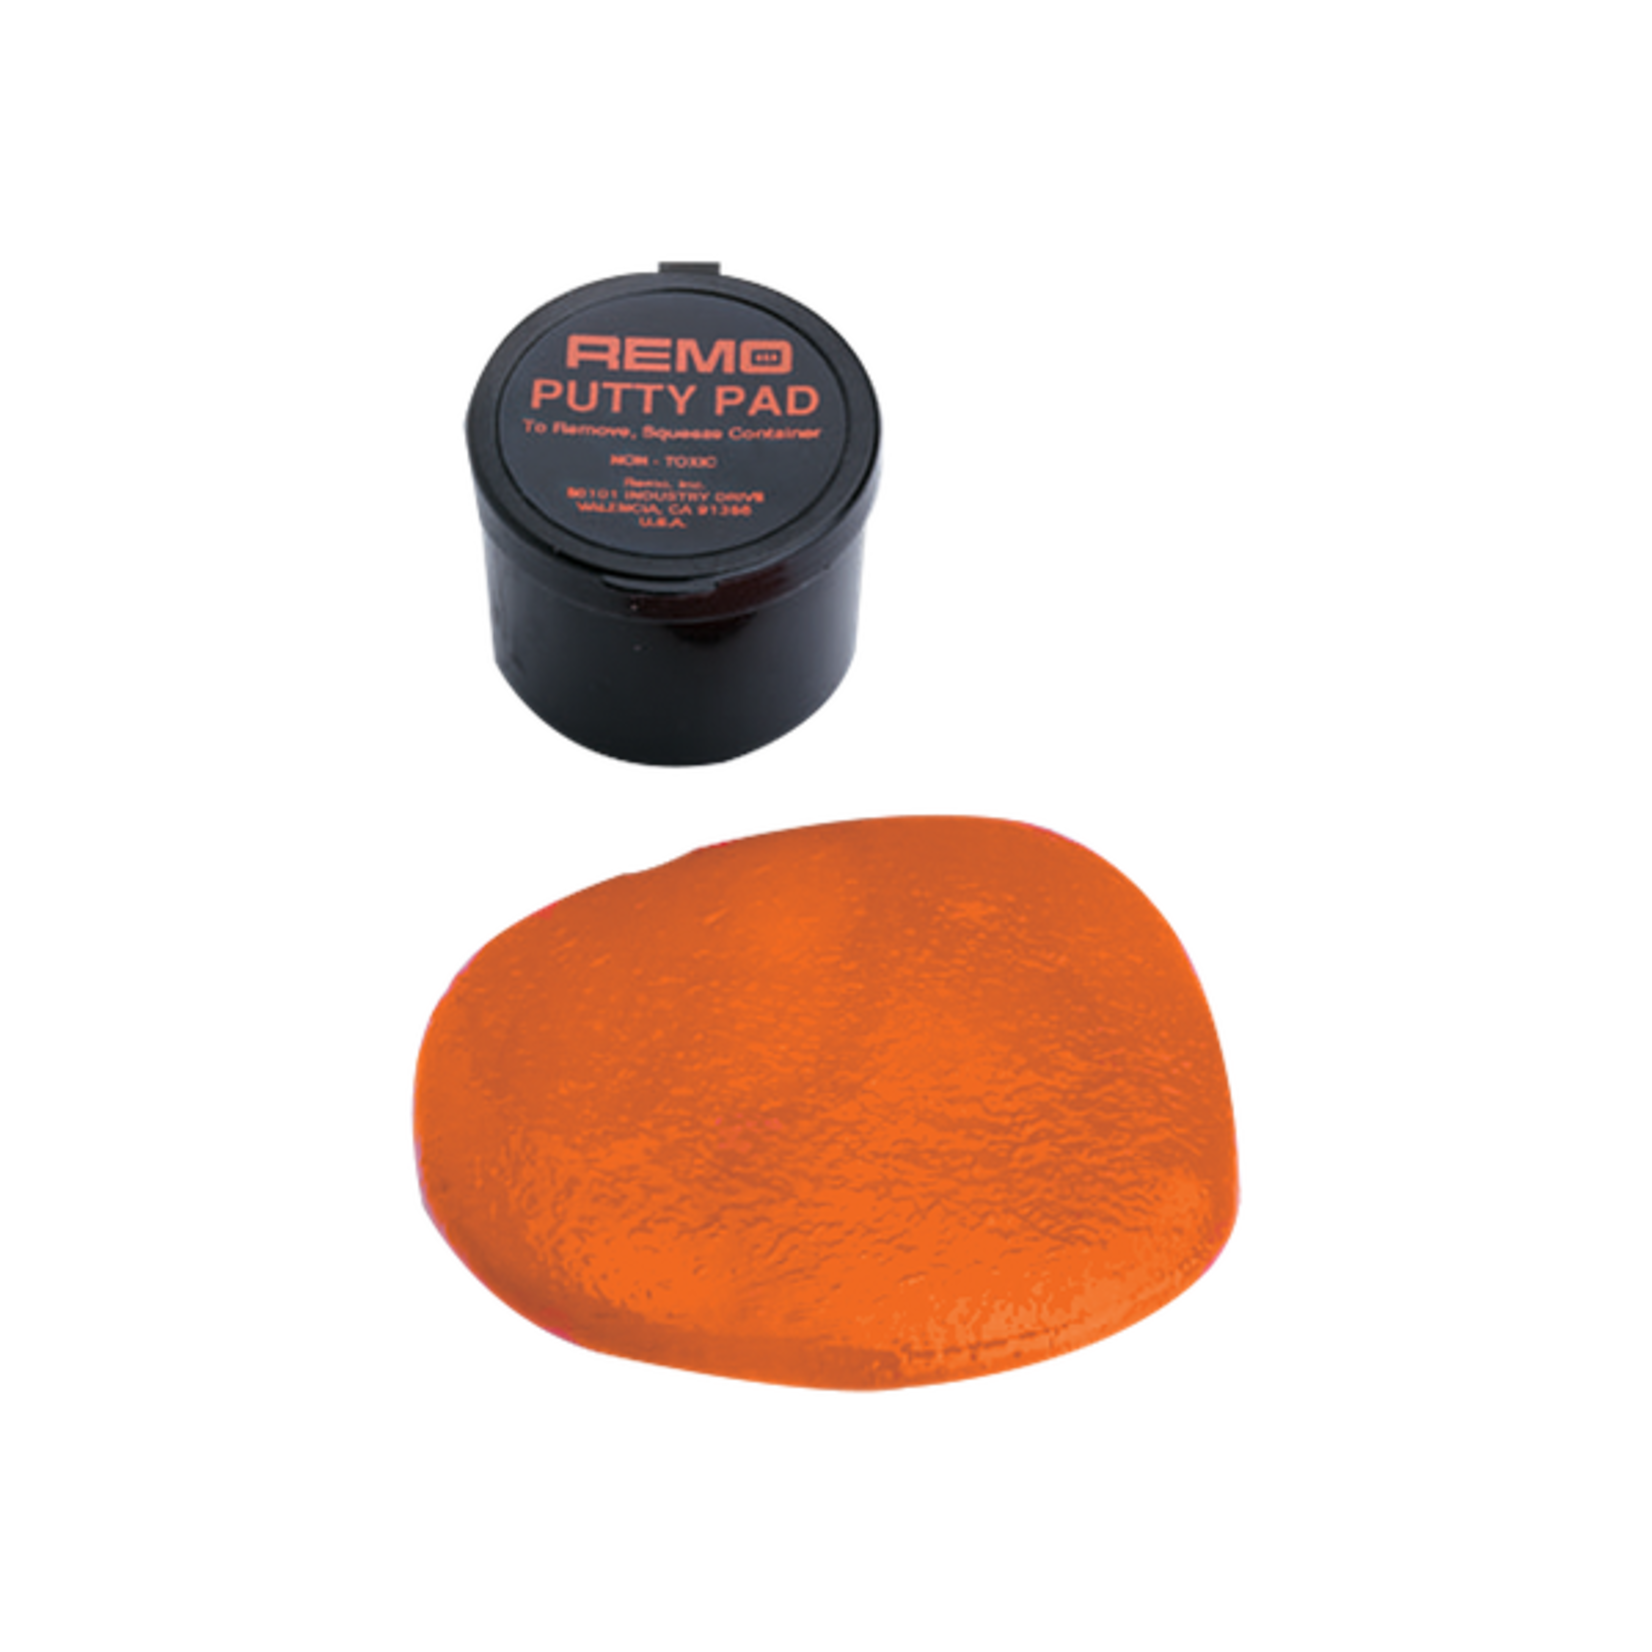 Remo PUTTY PAD Orange Boxed